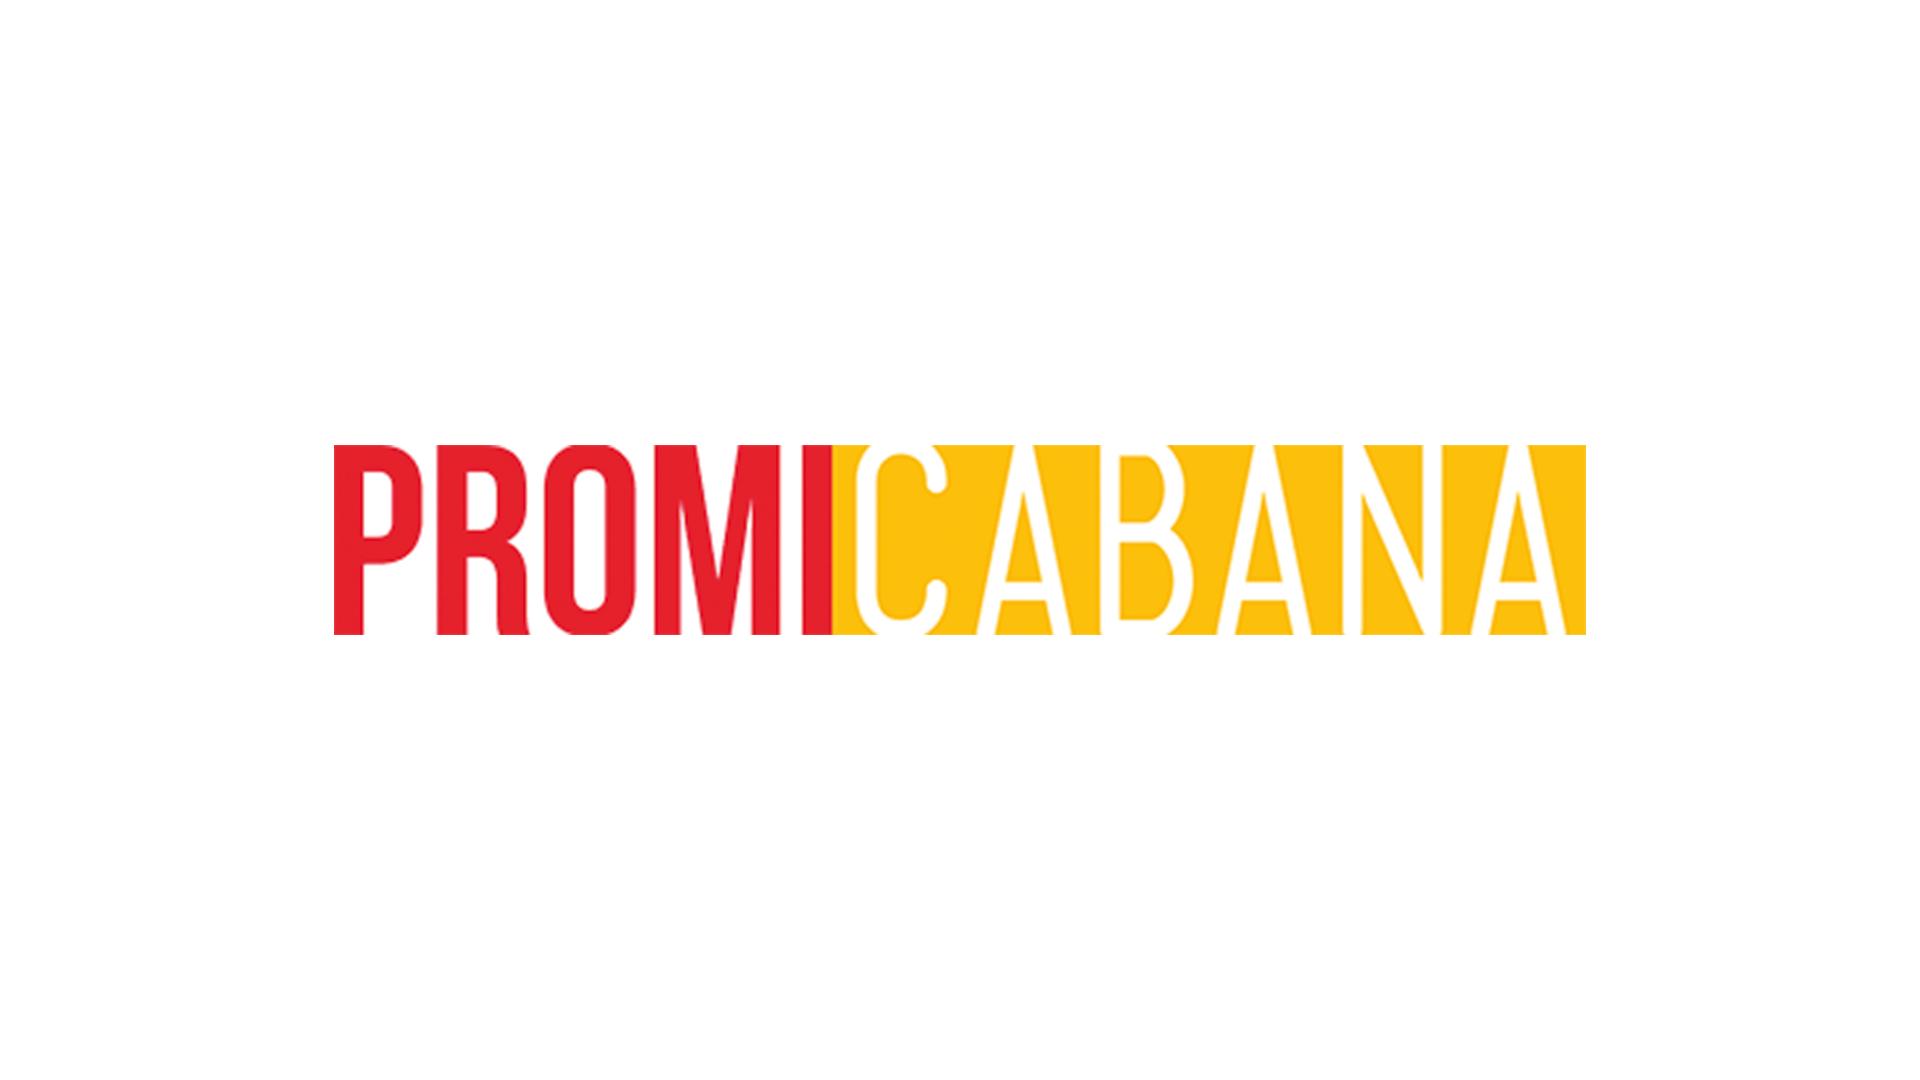 Miley-Cyrus-Ryan-Seacrest